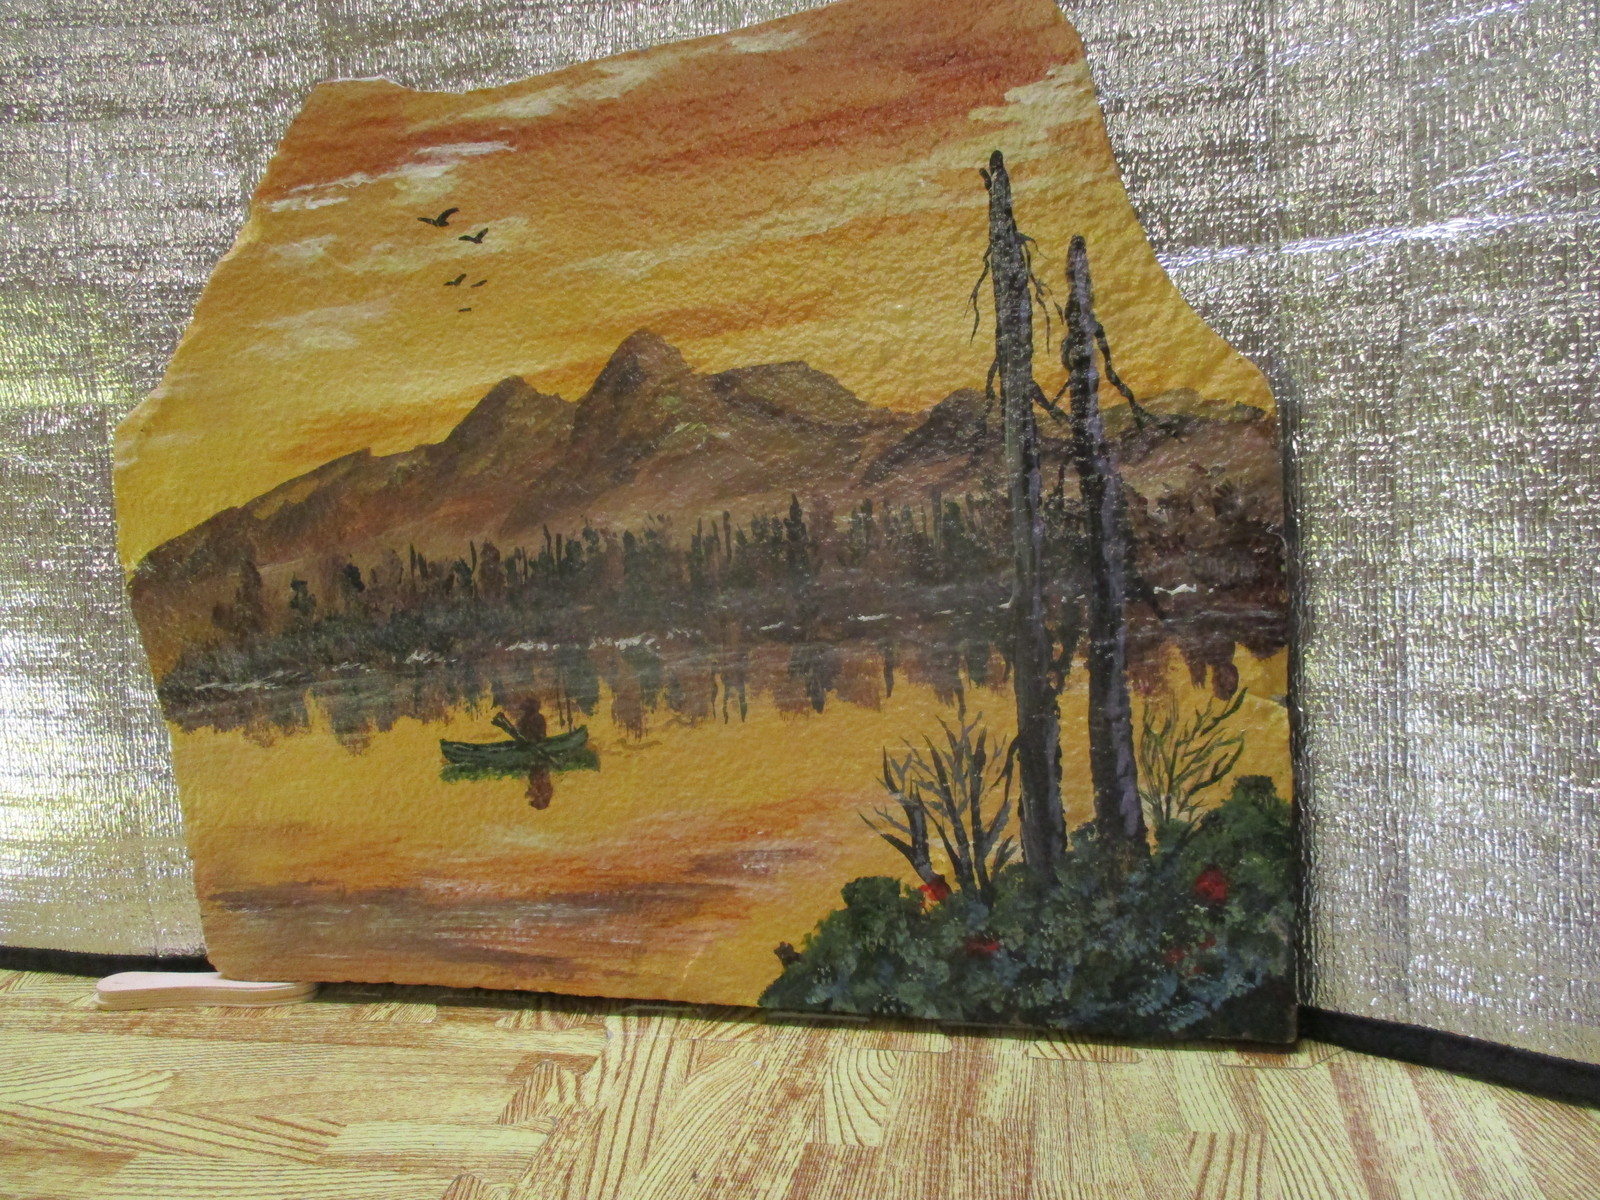 Late Autumn; Man in Canoe on the Lake